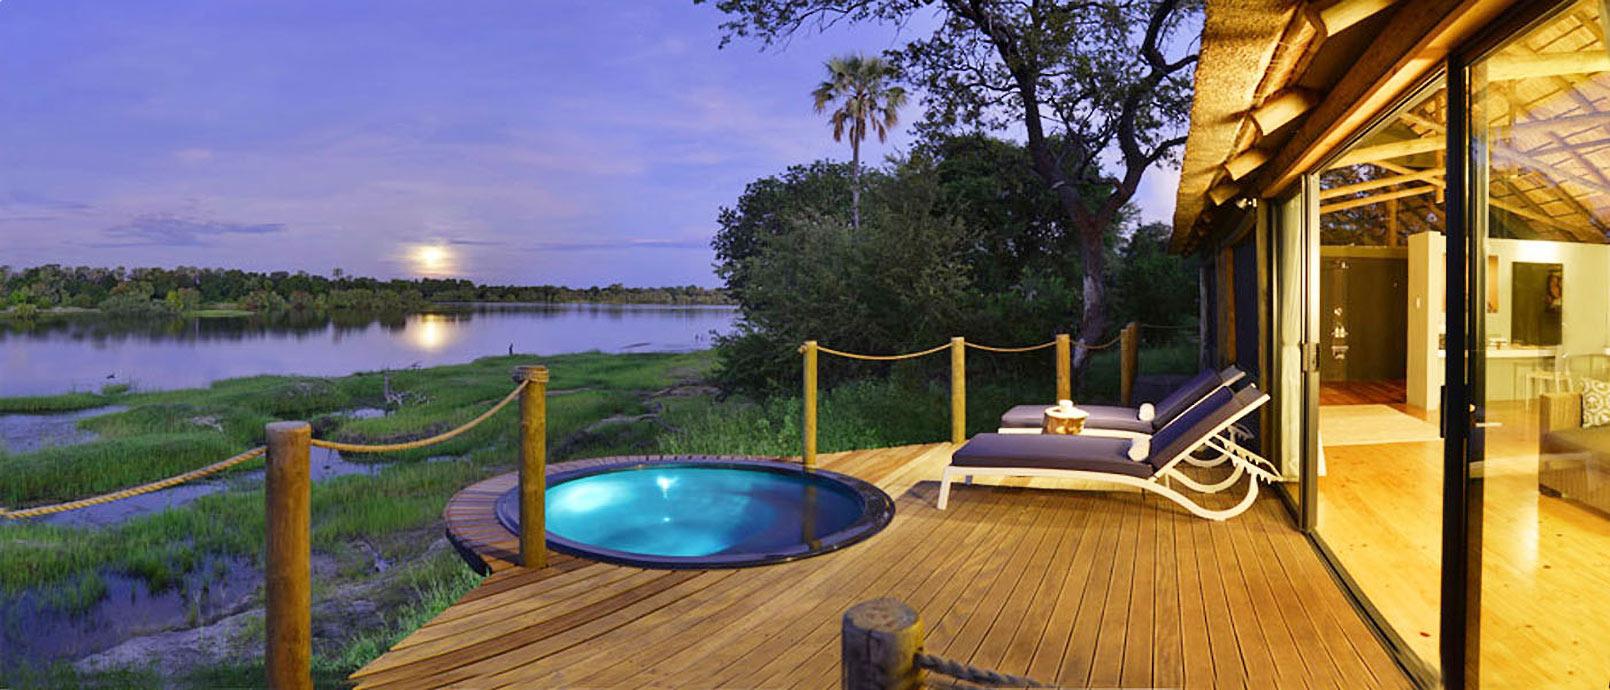 Victoria Falls River lodge L'Afrique au fil de l'eau